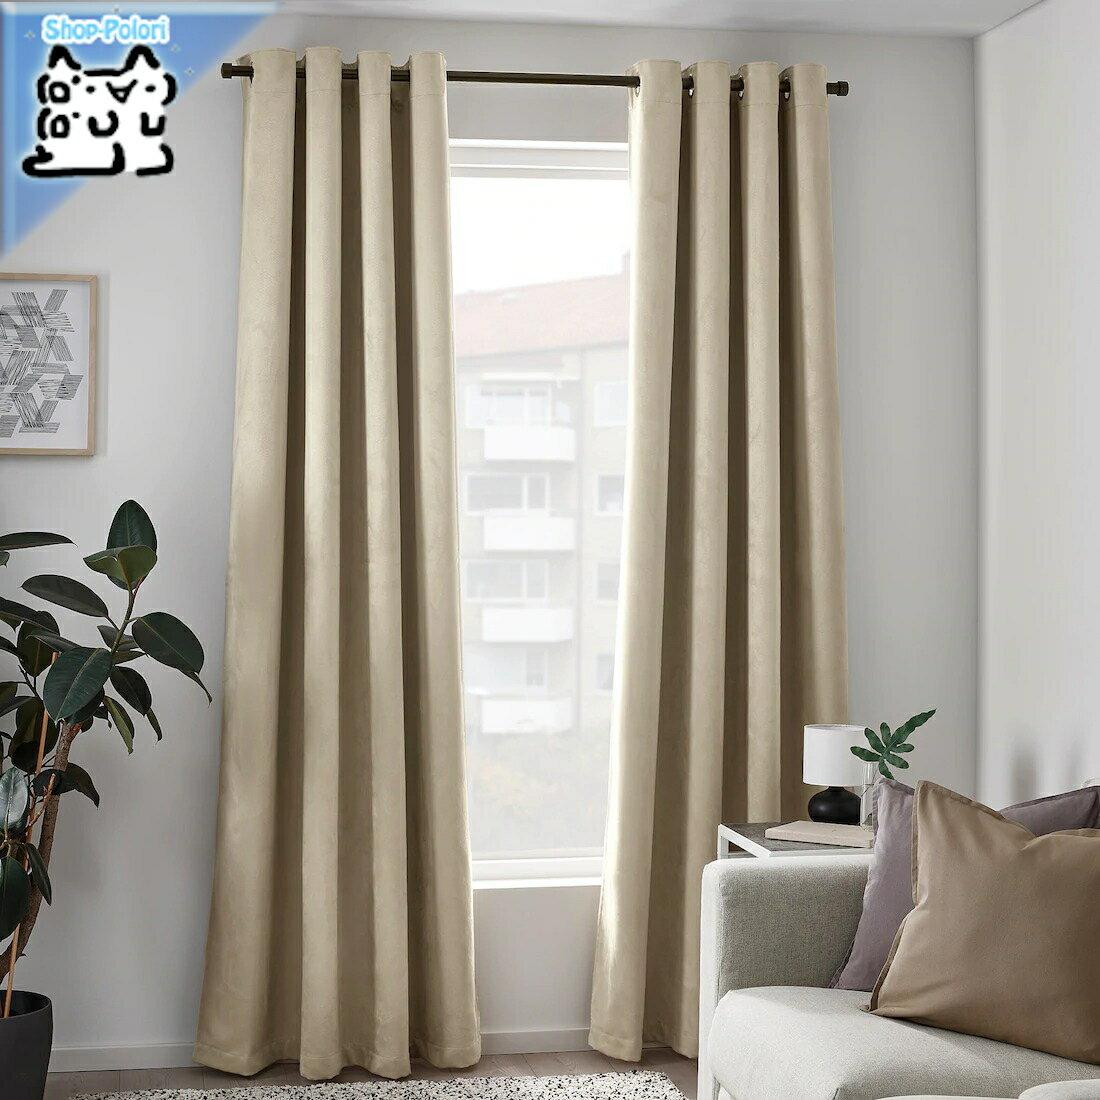 【IKEA Original】BIRTNA -ビルトナ- 遮光カーテン1組 ベージュ 145x250 cm